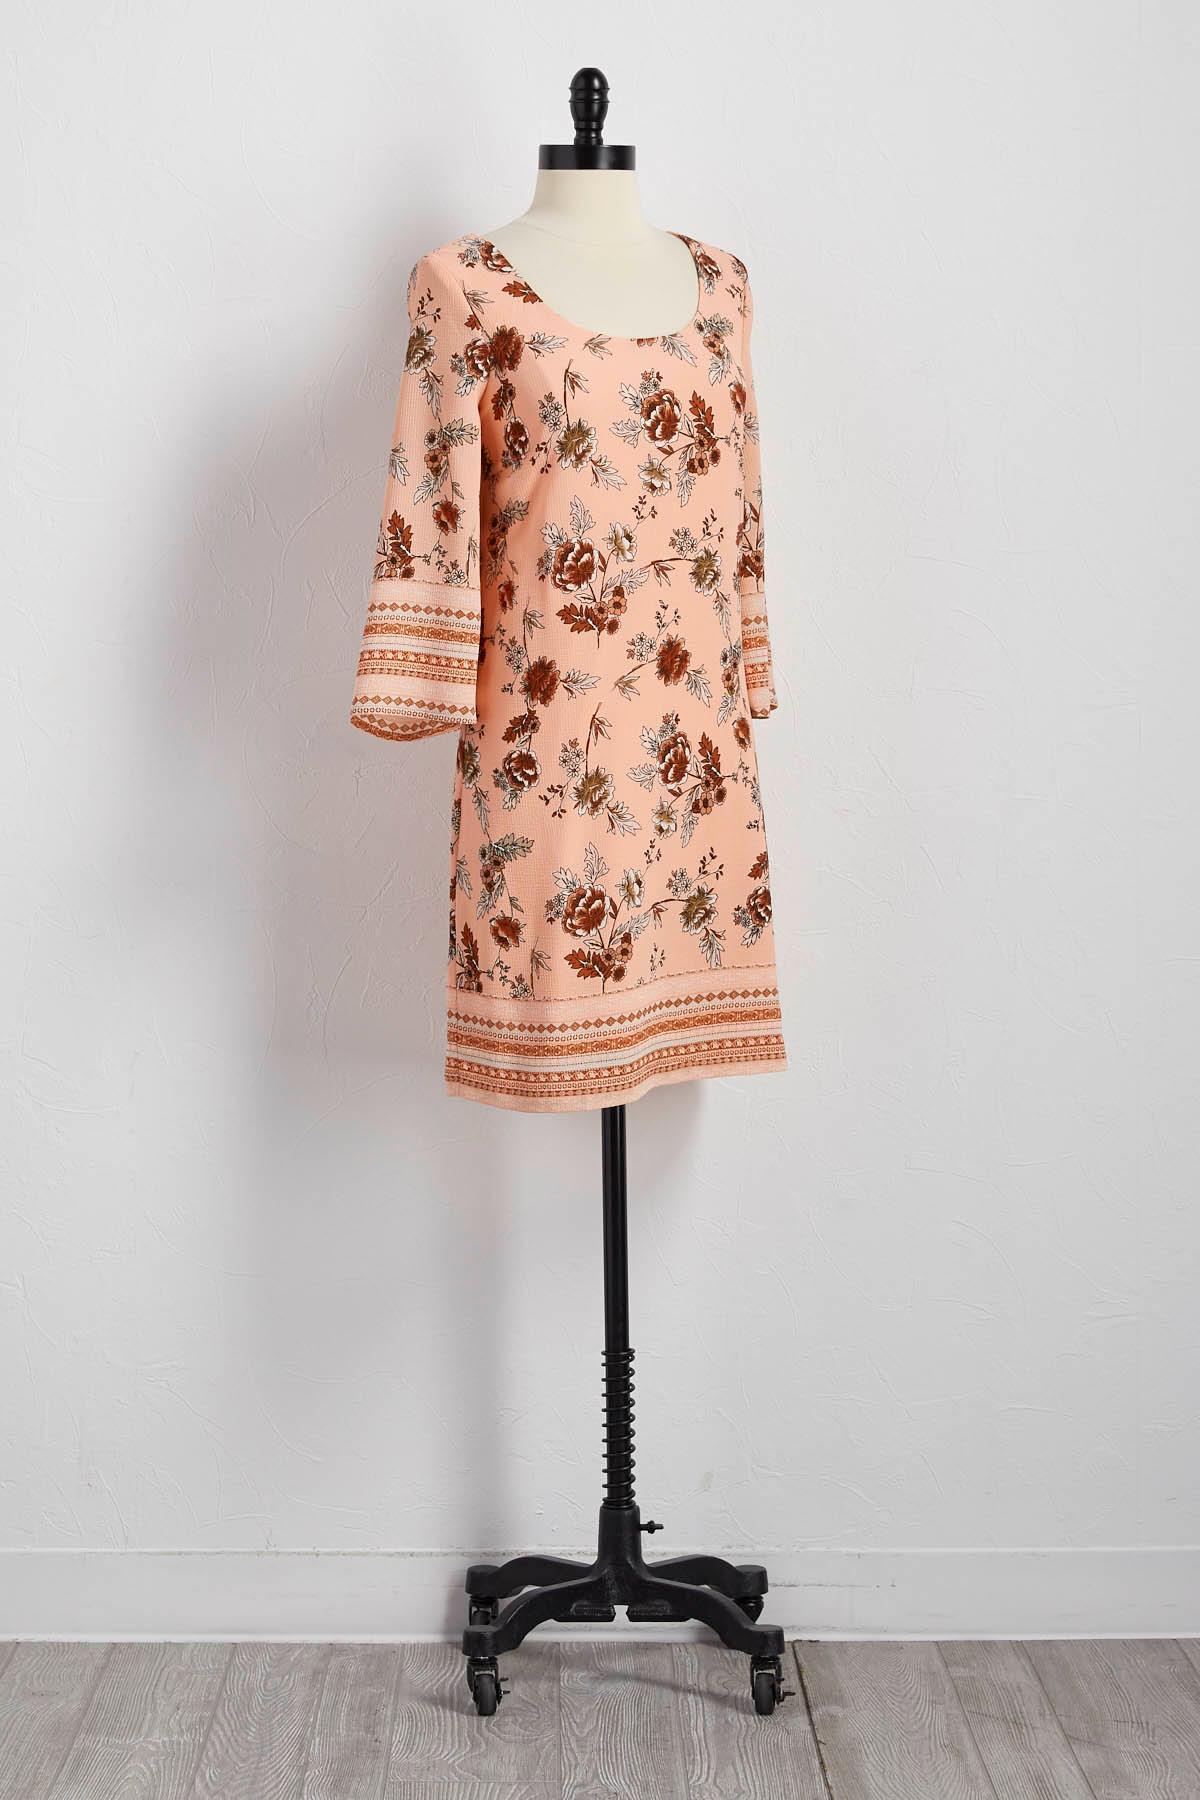 Bordered Floral Lattice Back Shift Dress